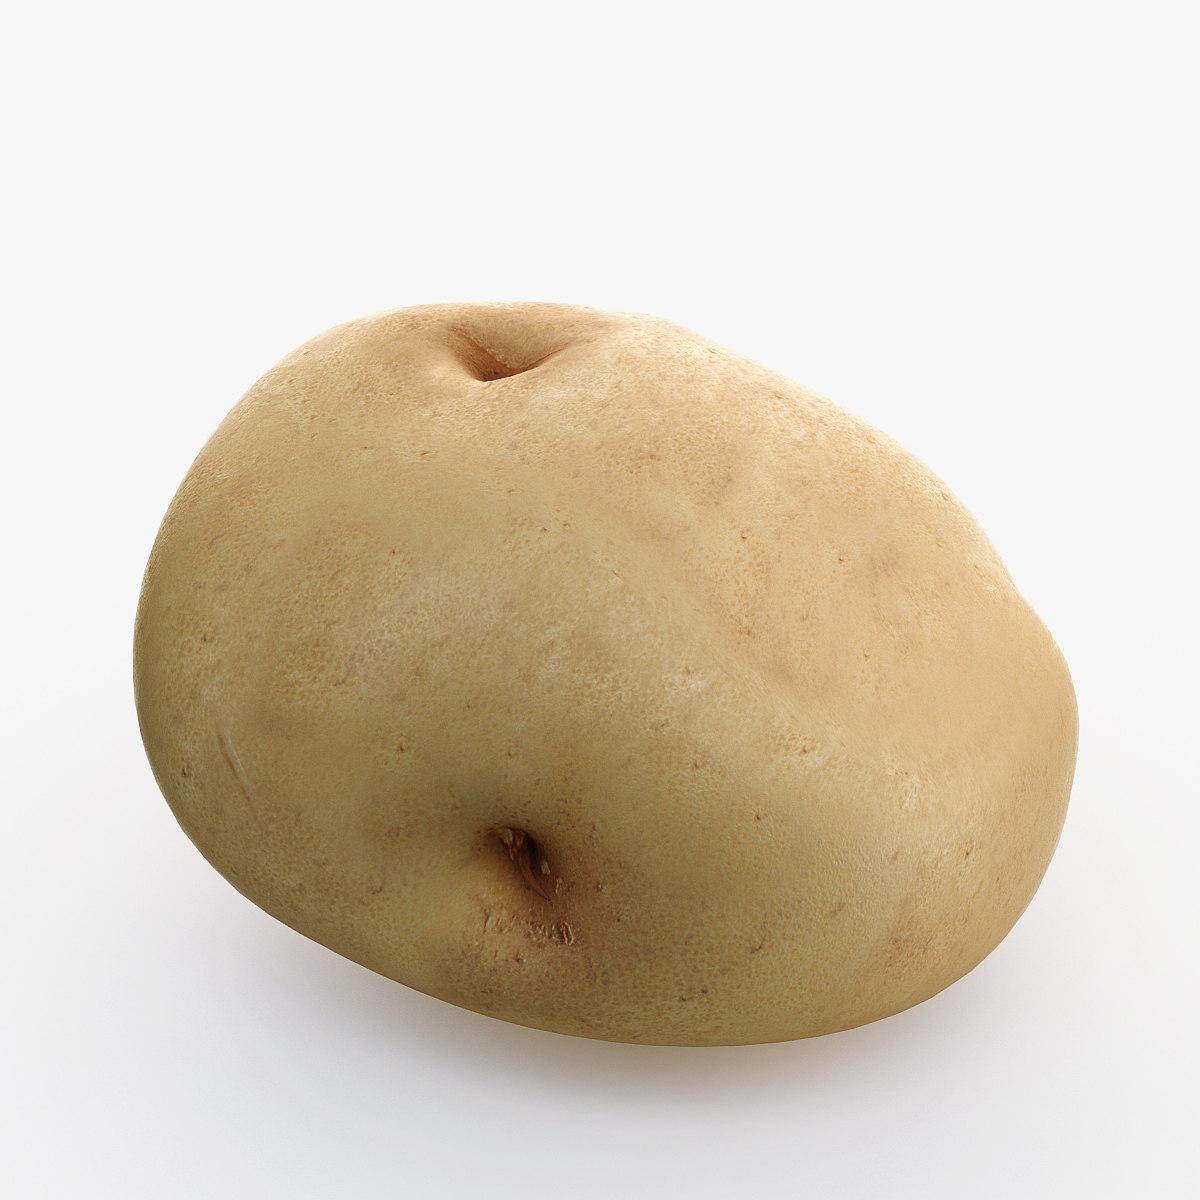 Potato_0001.jpg